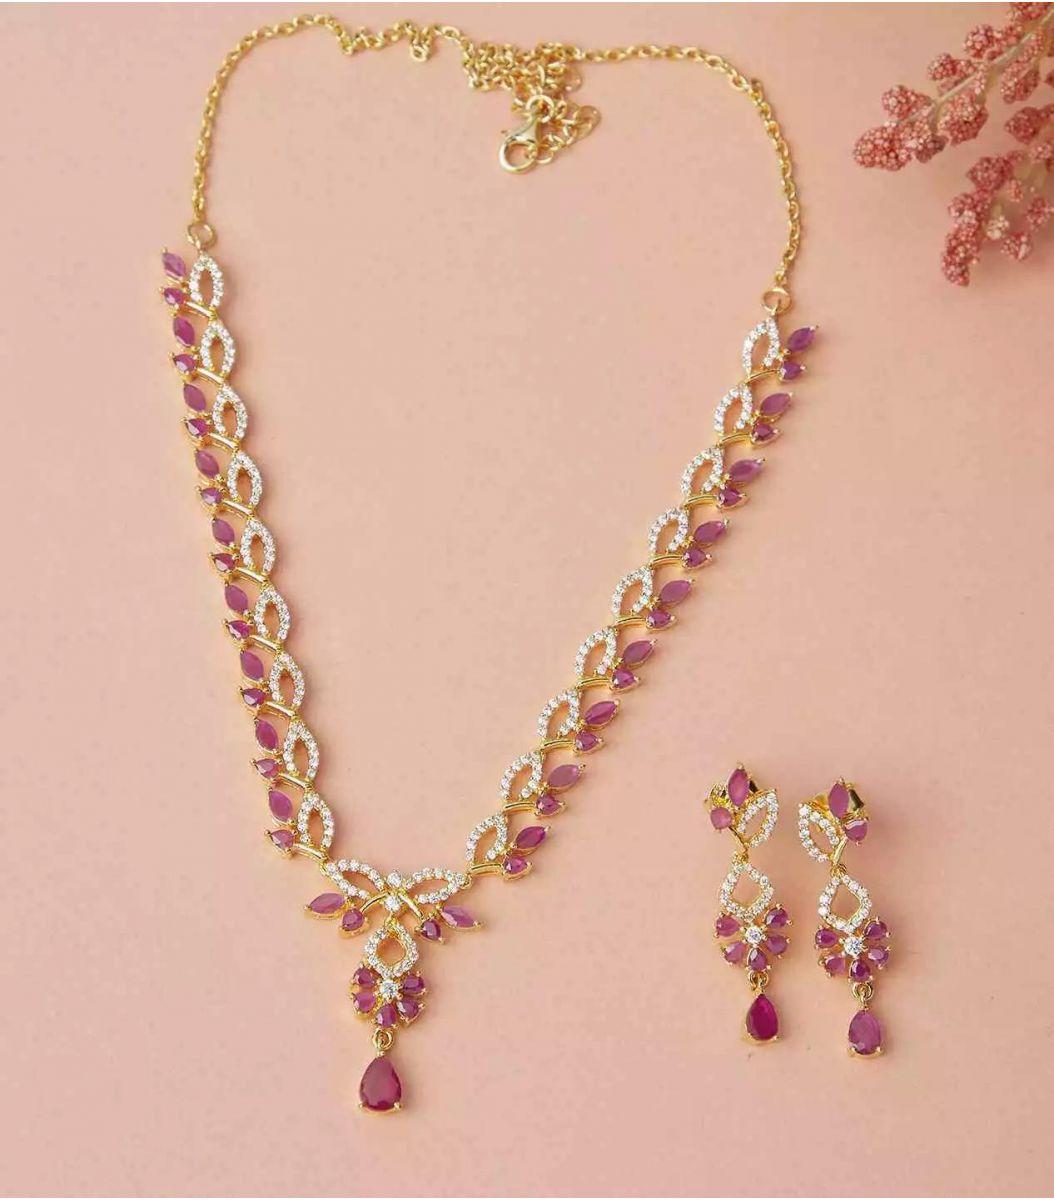 Silver Gold Polish Necklace FJ1660715